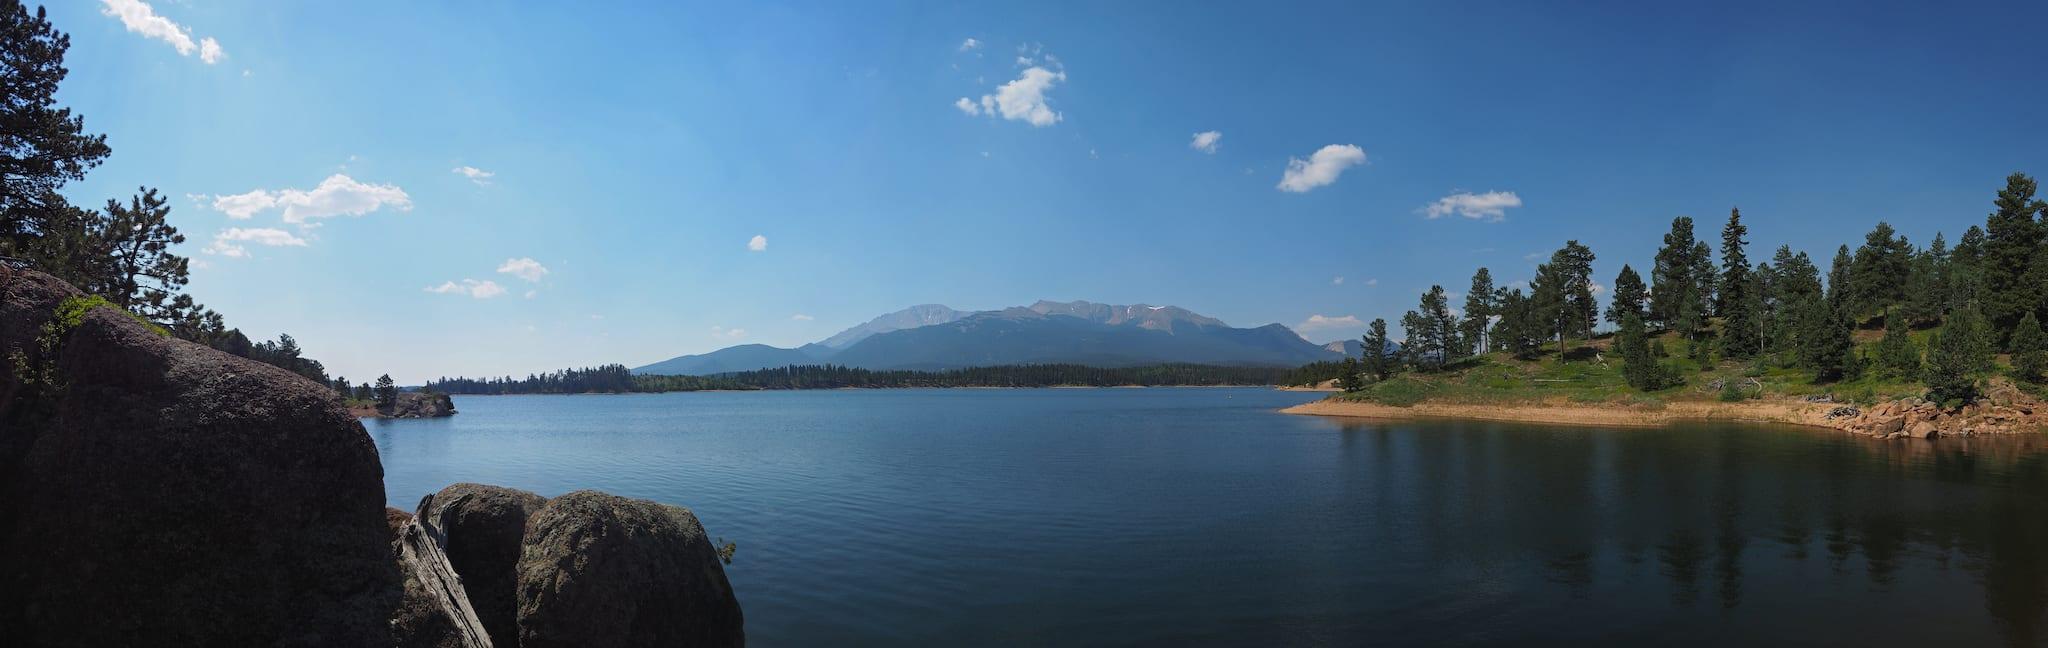 North Catamount Reservoir Pikes Peak Colorado Panorama